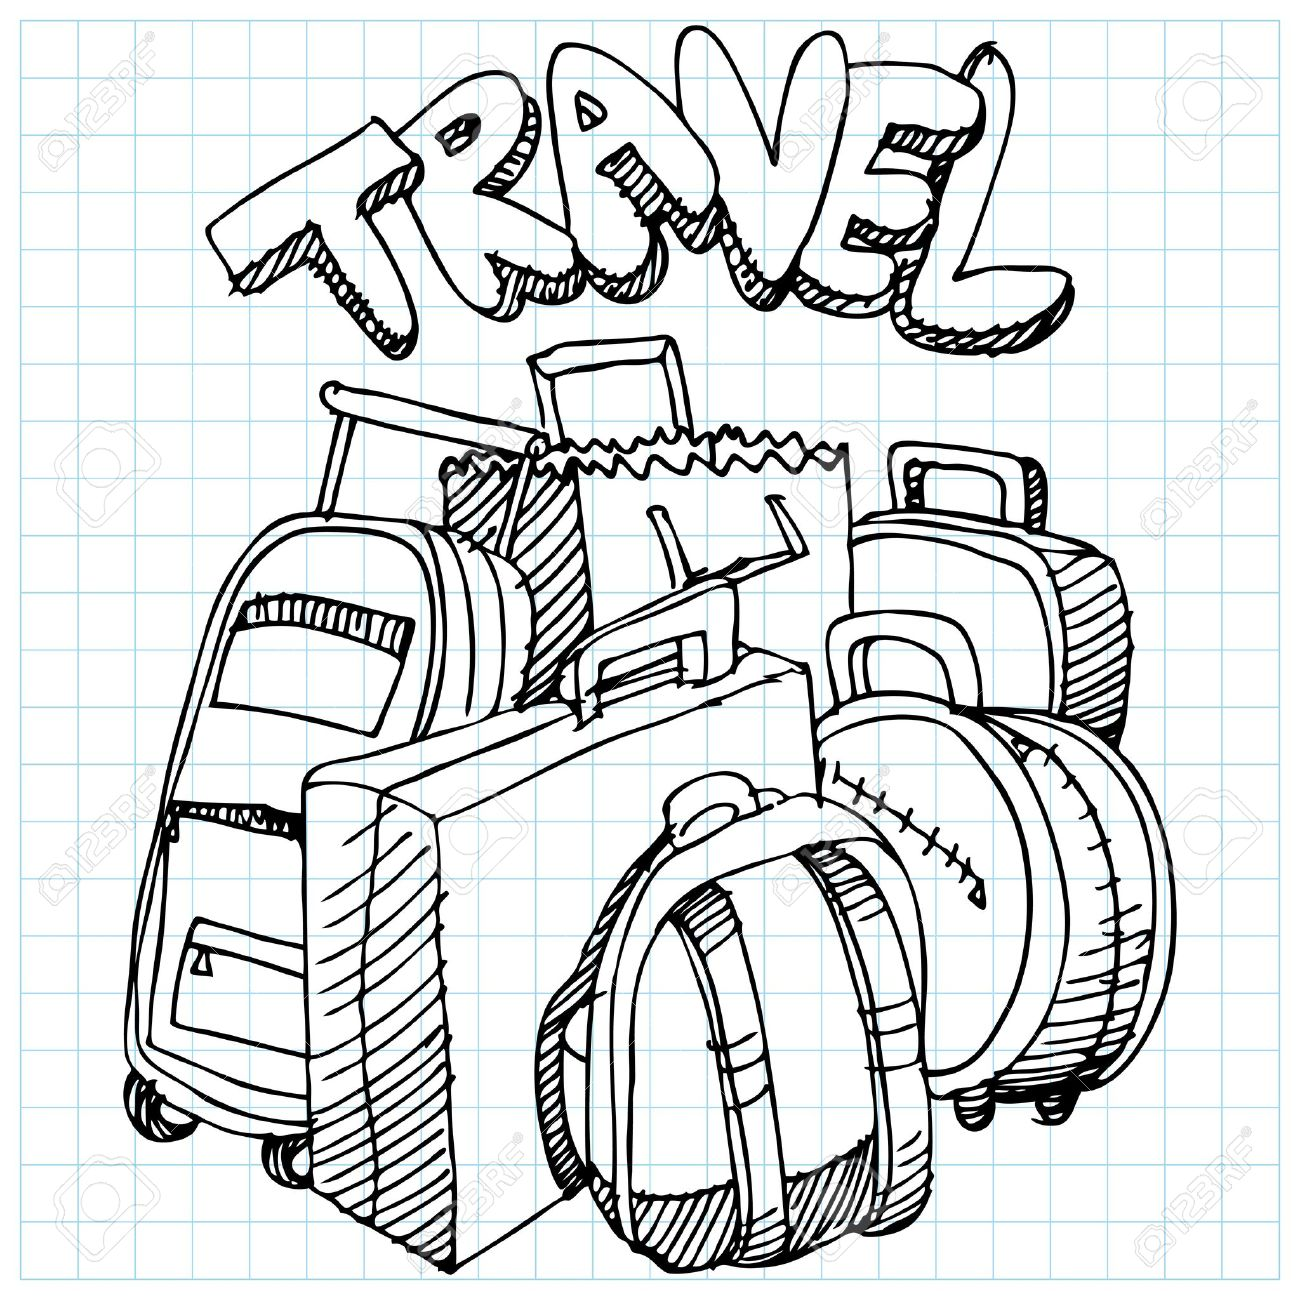 an image of a travel bag drawing royalty free cliparts vectors